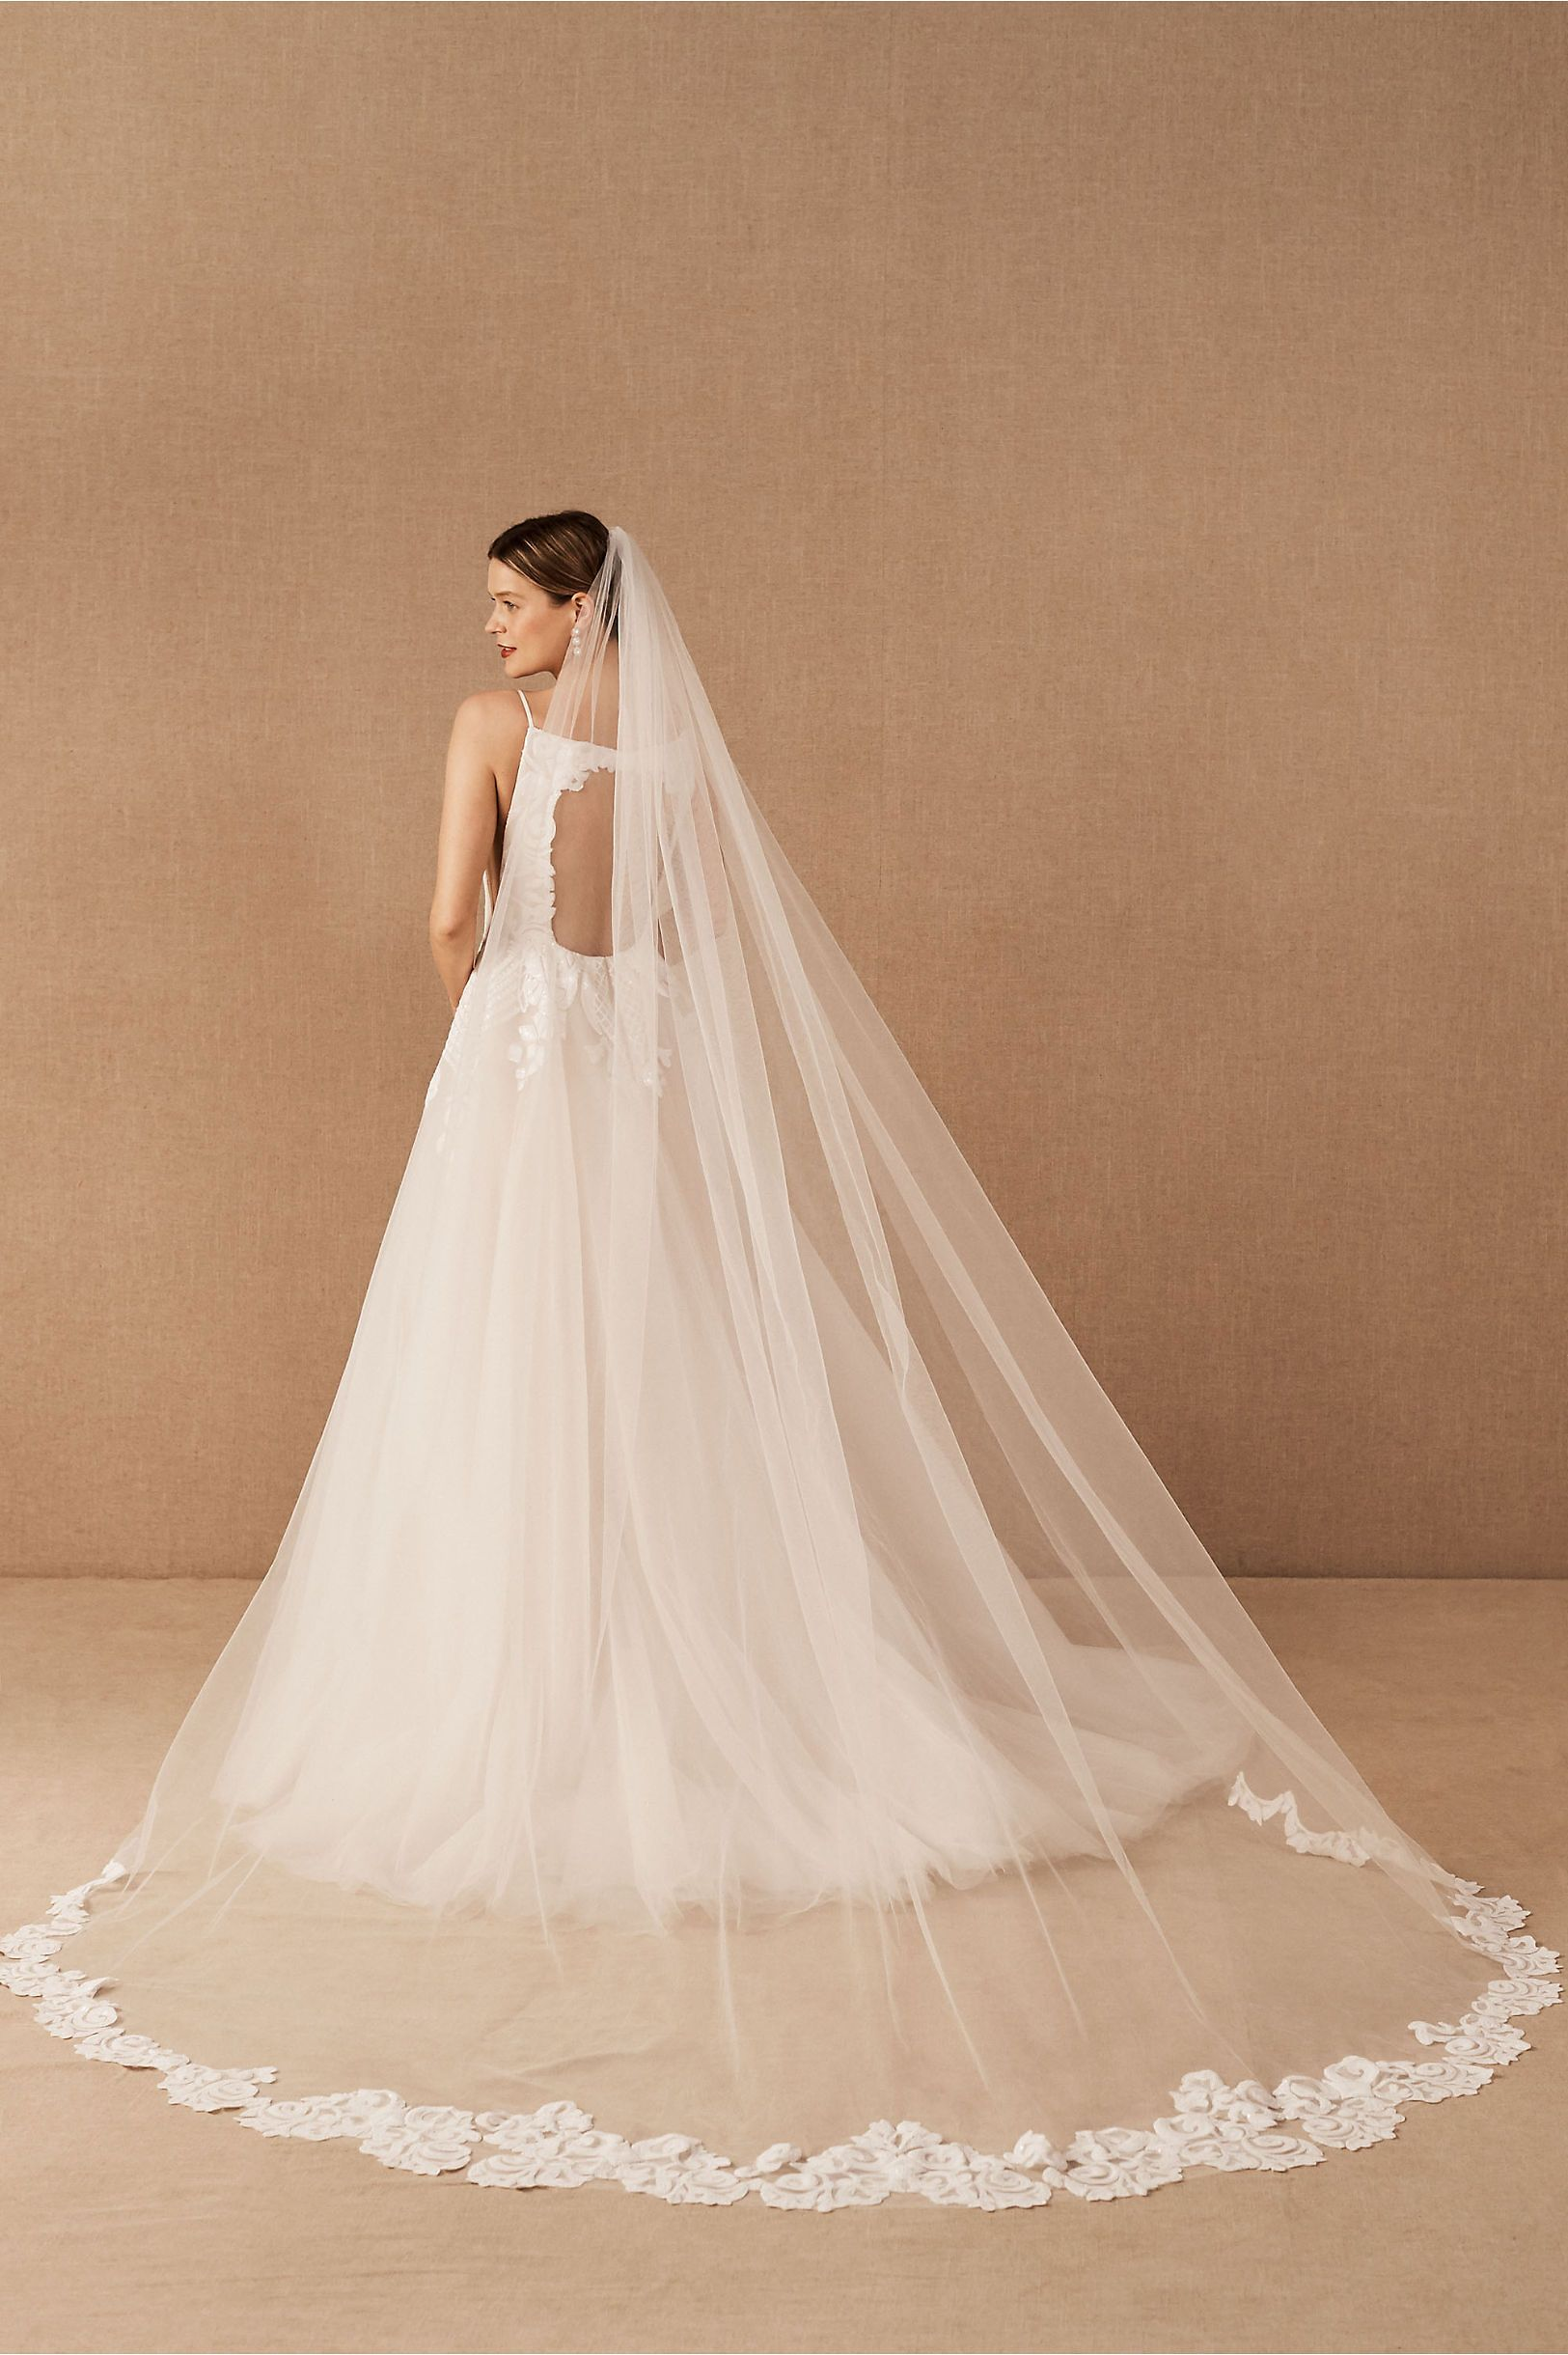 Dramatic Bridal Veil From Hayley Paige X Bhldn Long Veils Bridal Dream Wedding Ideas Dresses Bridal Veils And Headpieces [ 2440 x 1625 Pixel ]